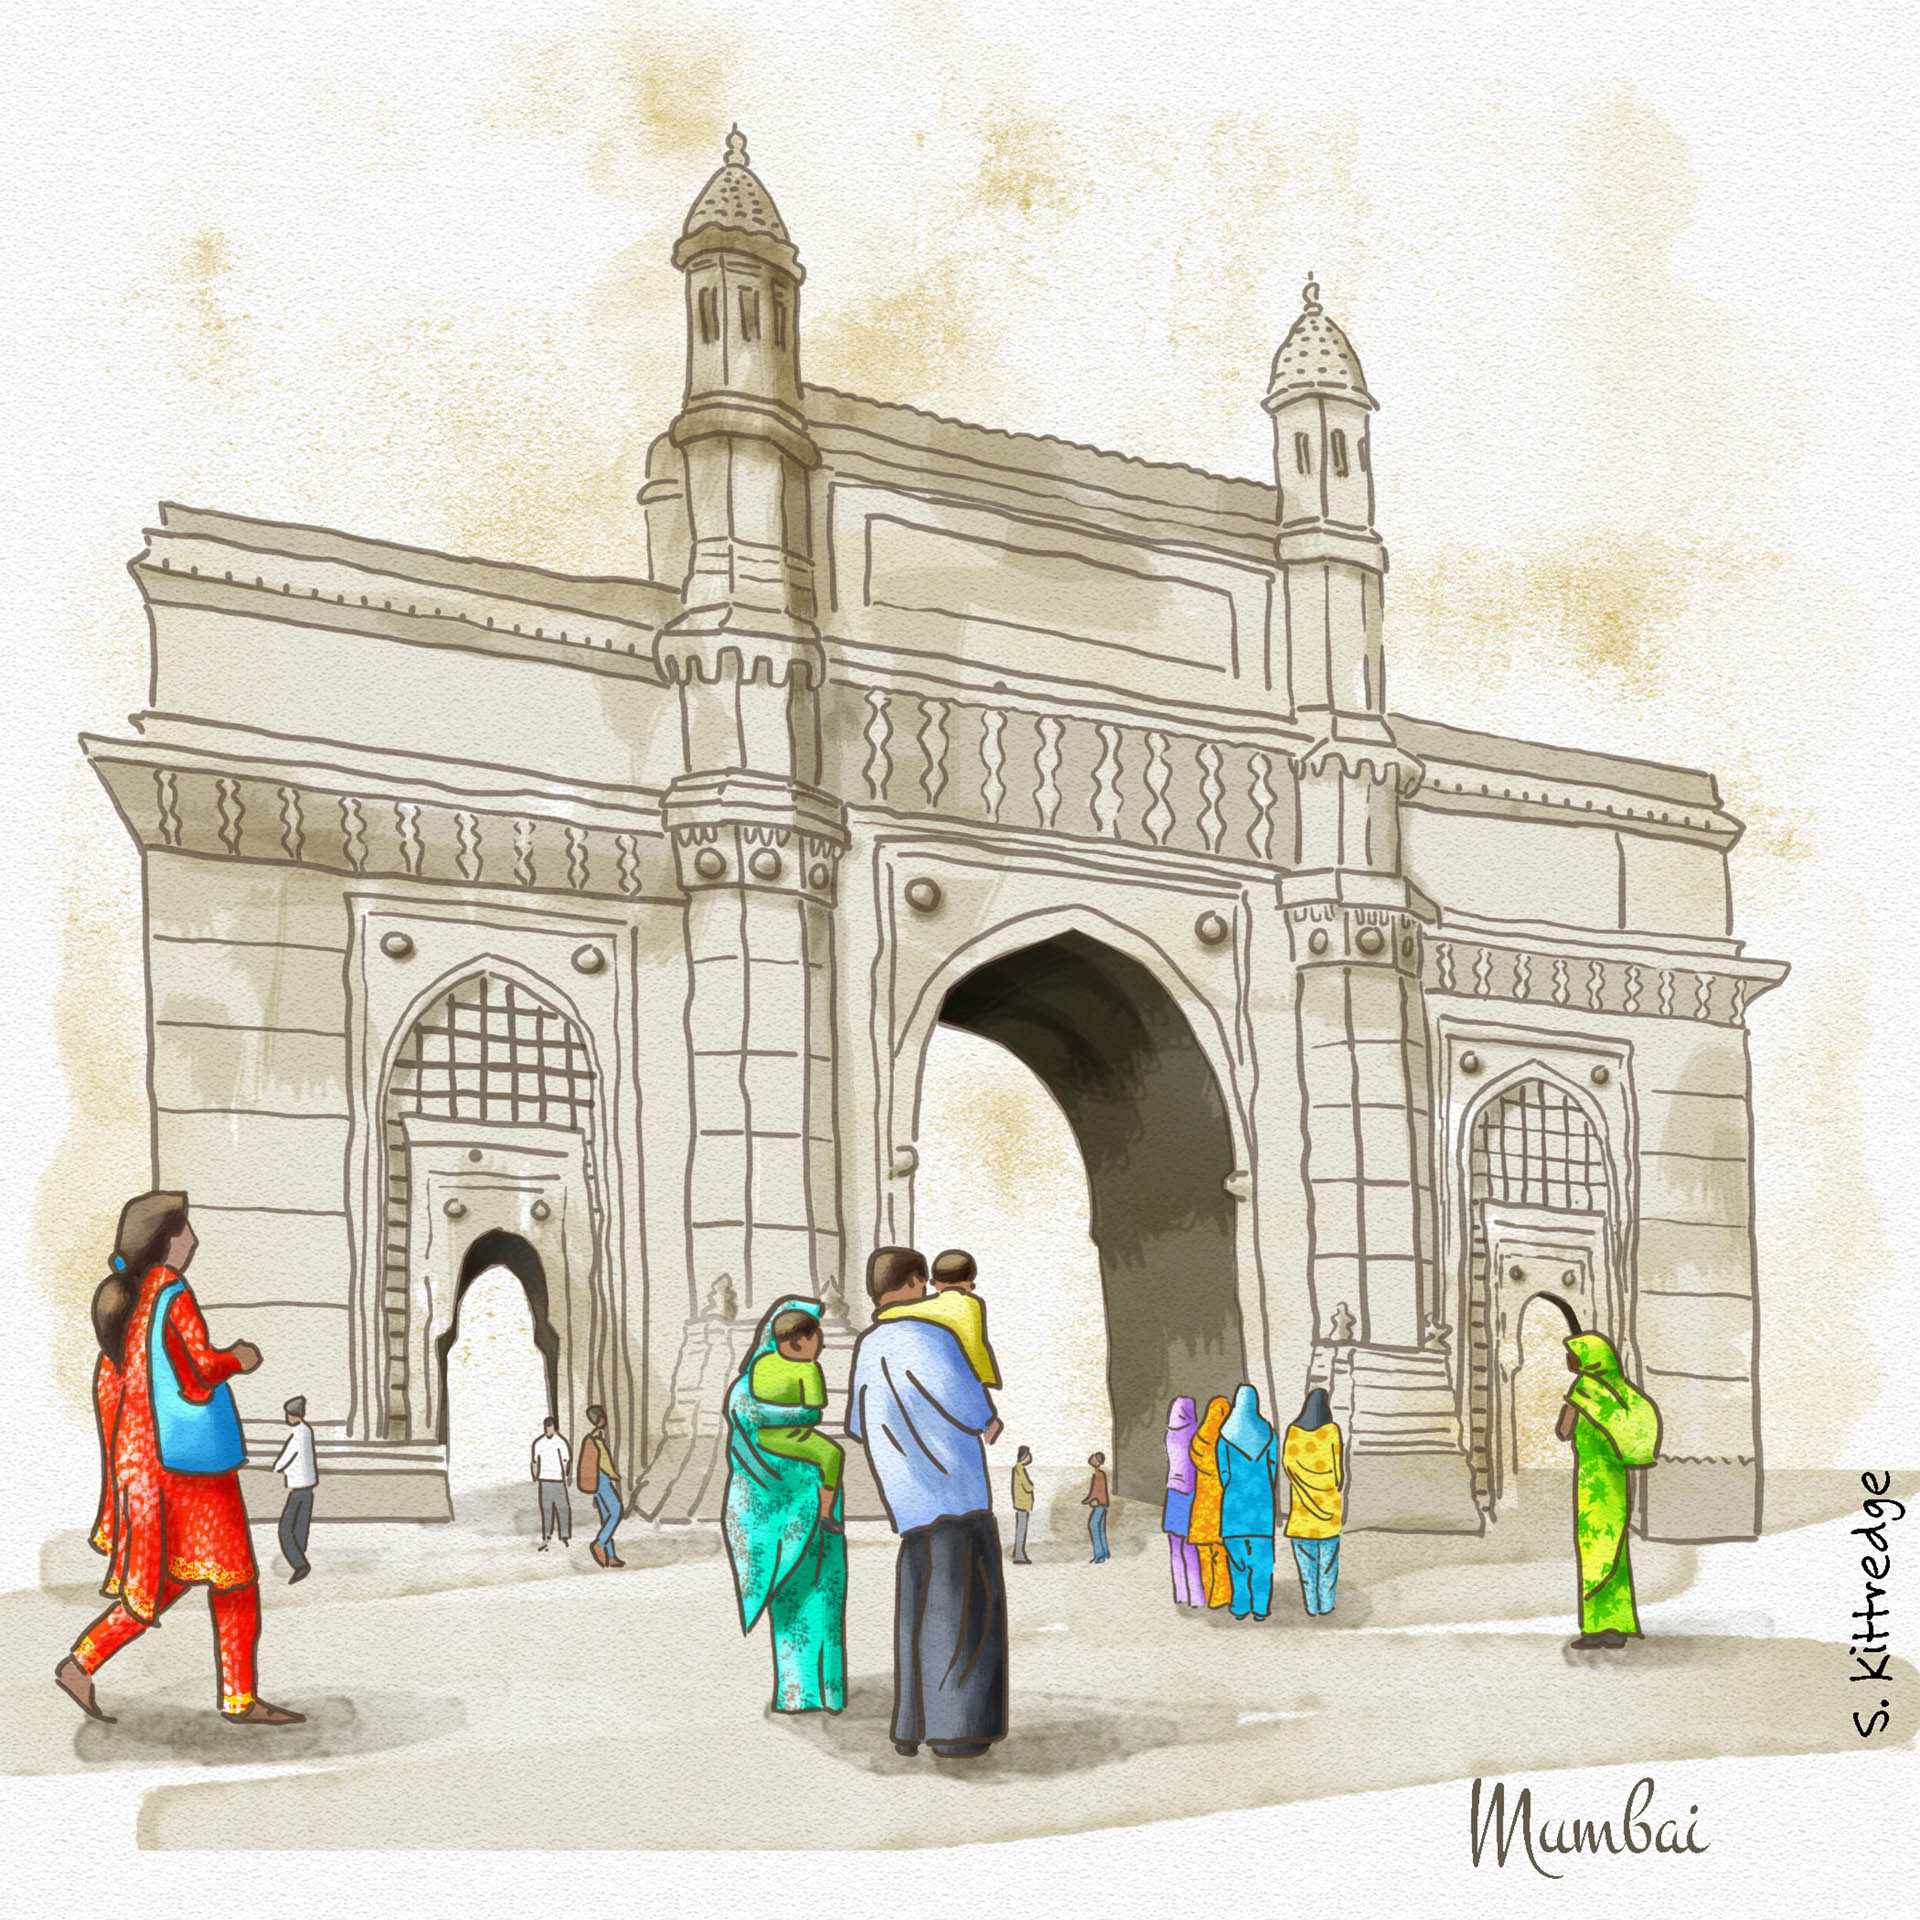 Mumbai Inktober Illustration 2020 • Project: They Draw & Travel